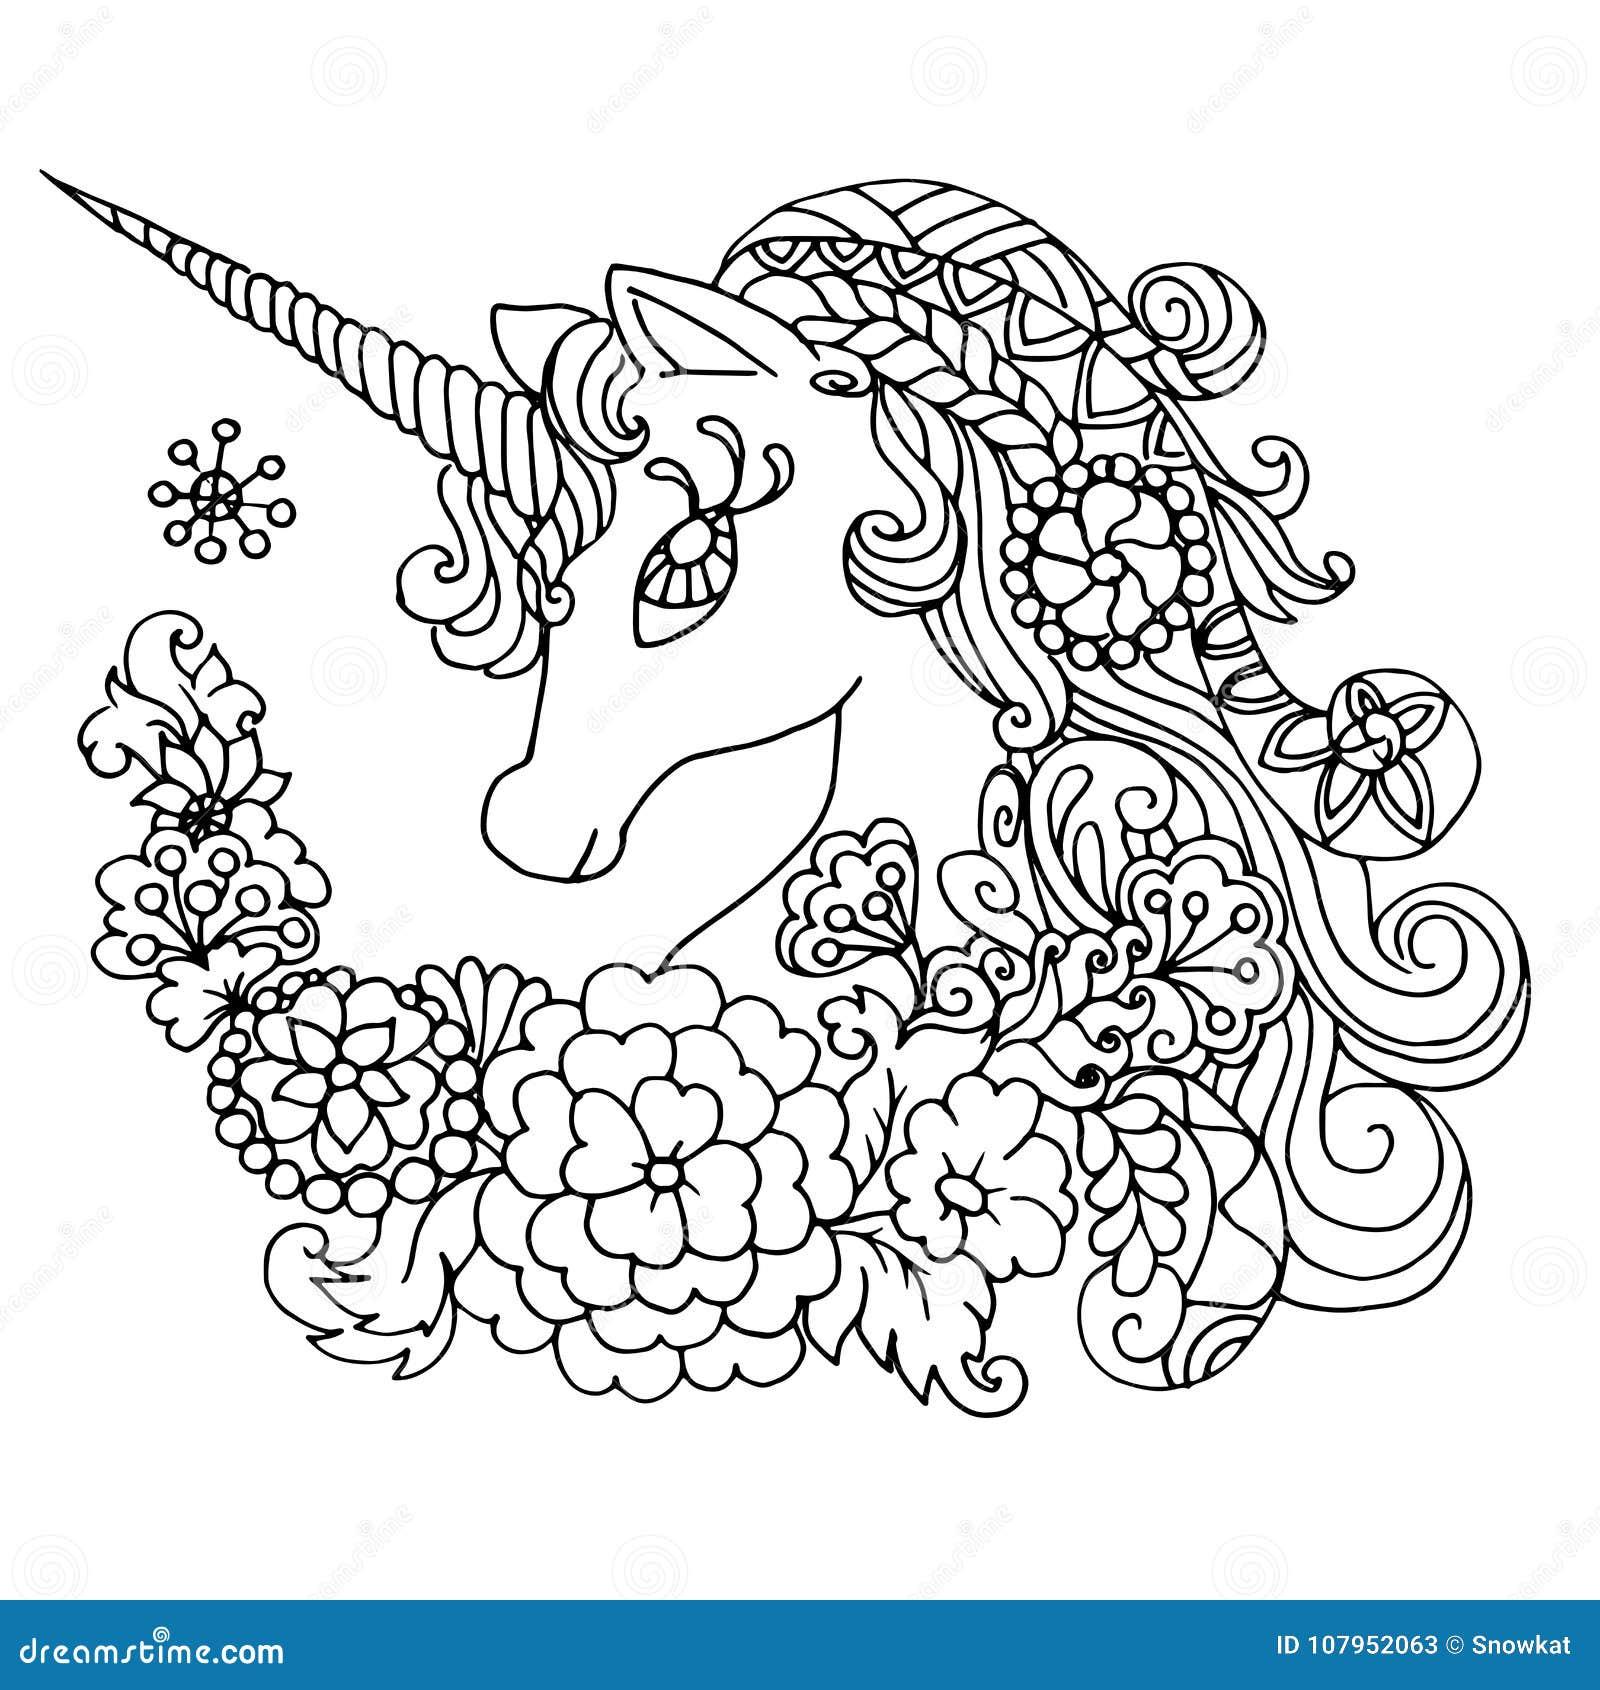 Coloriage Adulte Licorne.Licorne Blanche Fabuleuse De Livre De Coloriage Illustration De